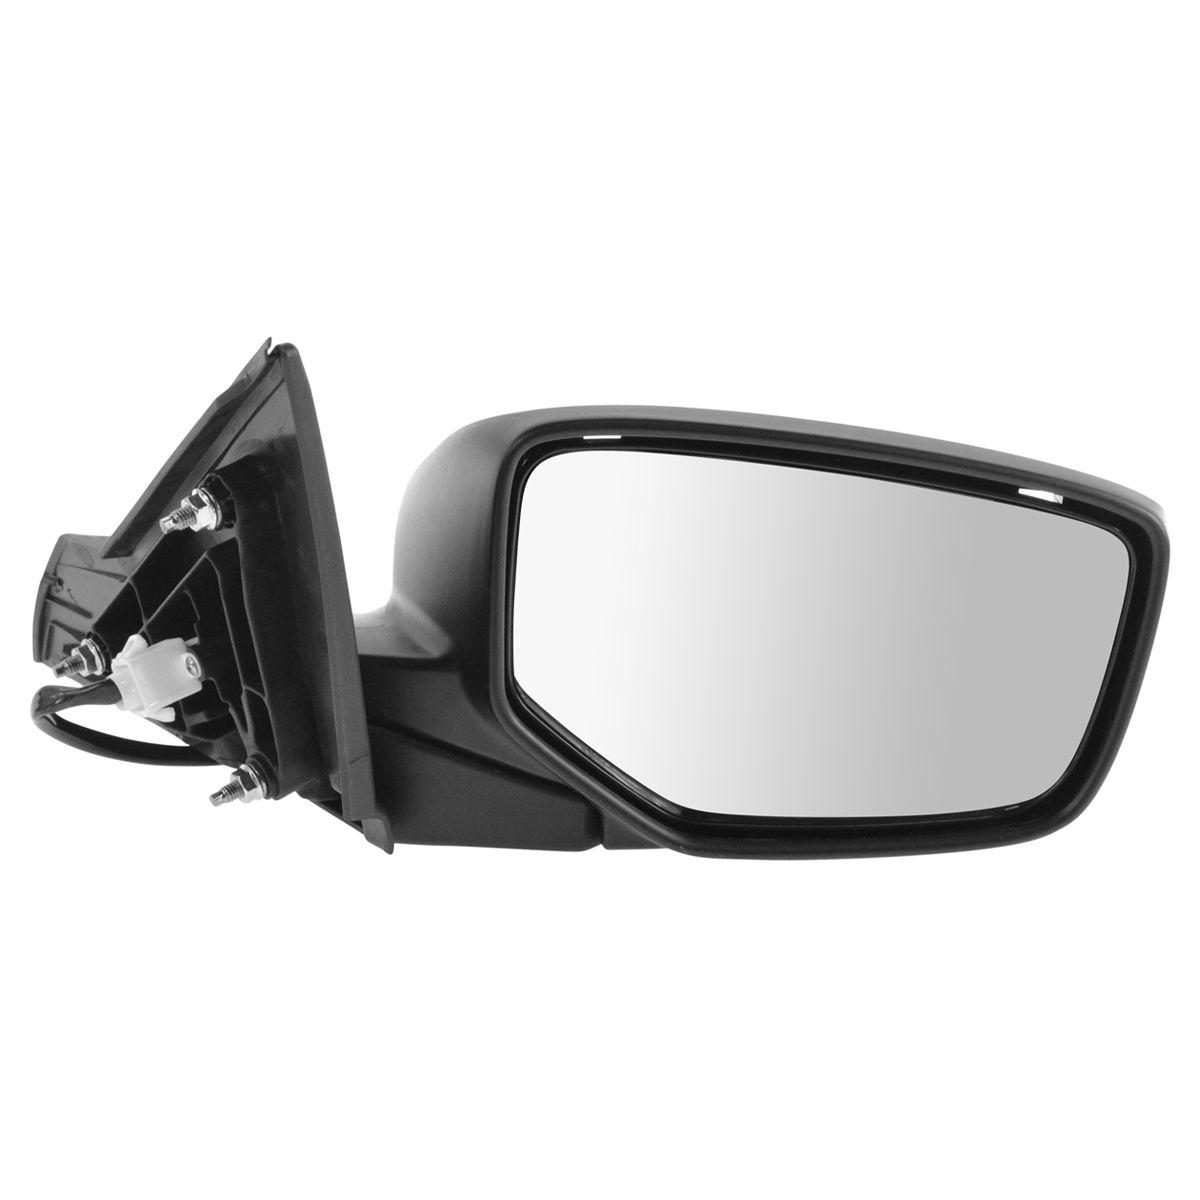 Power Mirror LH Left Driver Side for Honda Accord 4dr Sedan